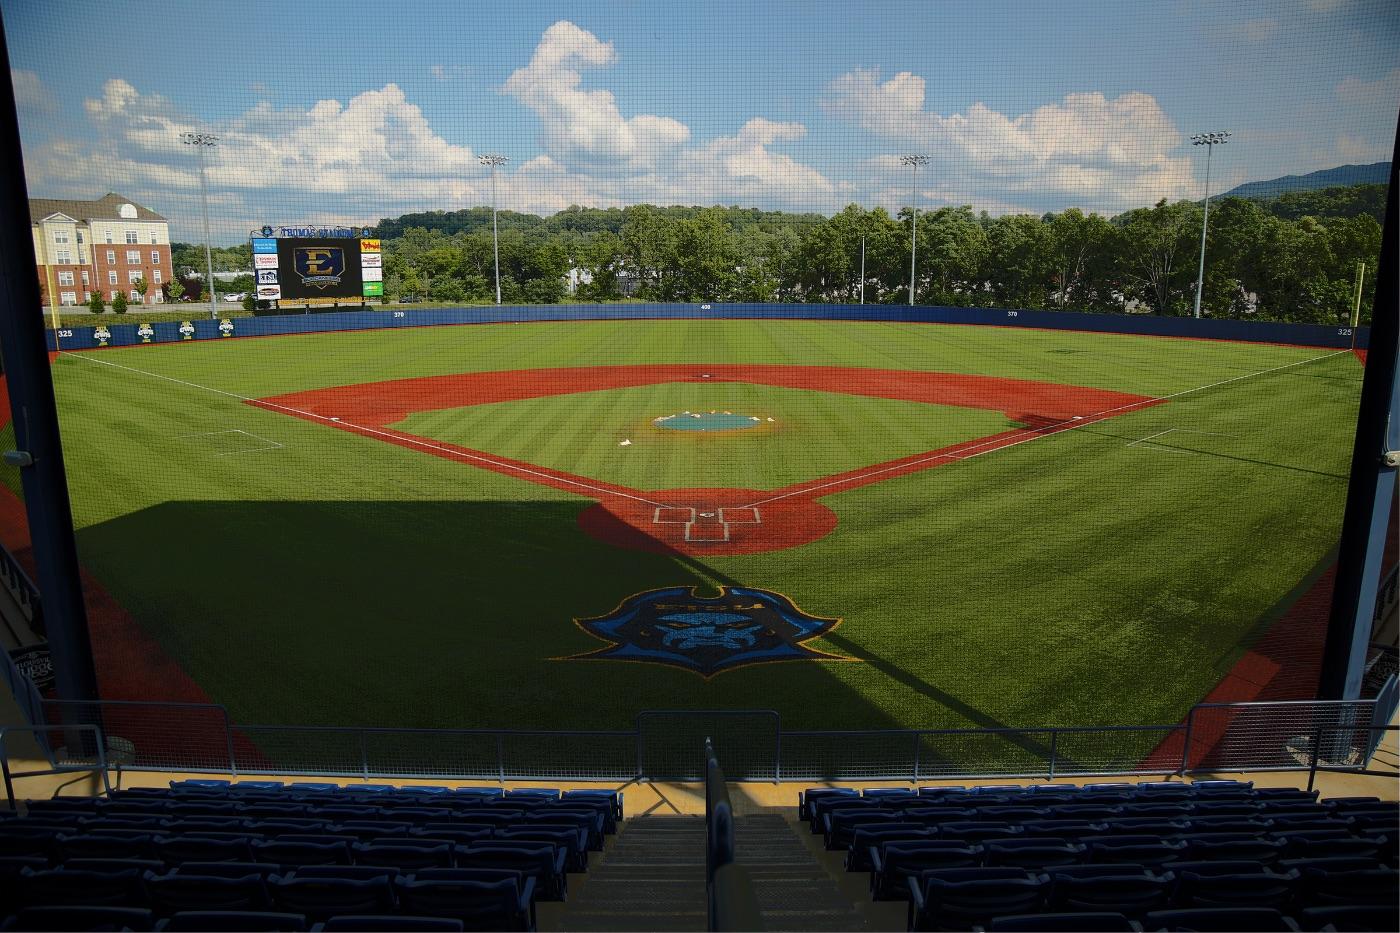 ETSU's Baseball Game vs Western Carolina Cancelled